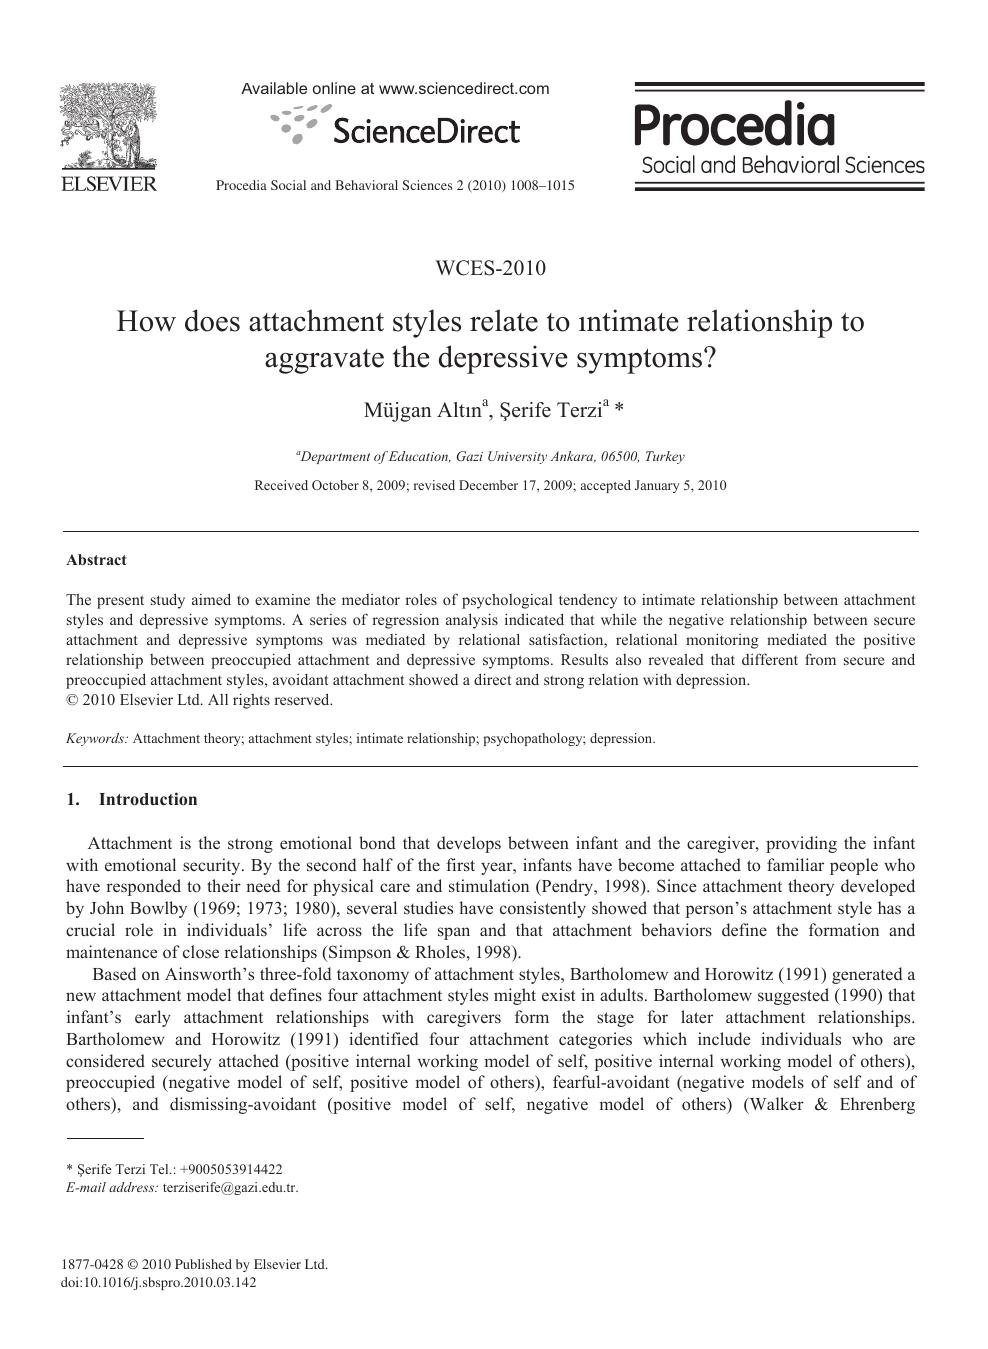 Scoring relationship questionnaire bartholomew Adult attachment